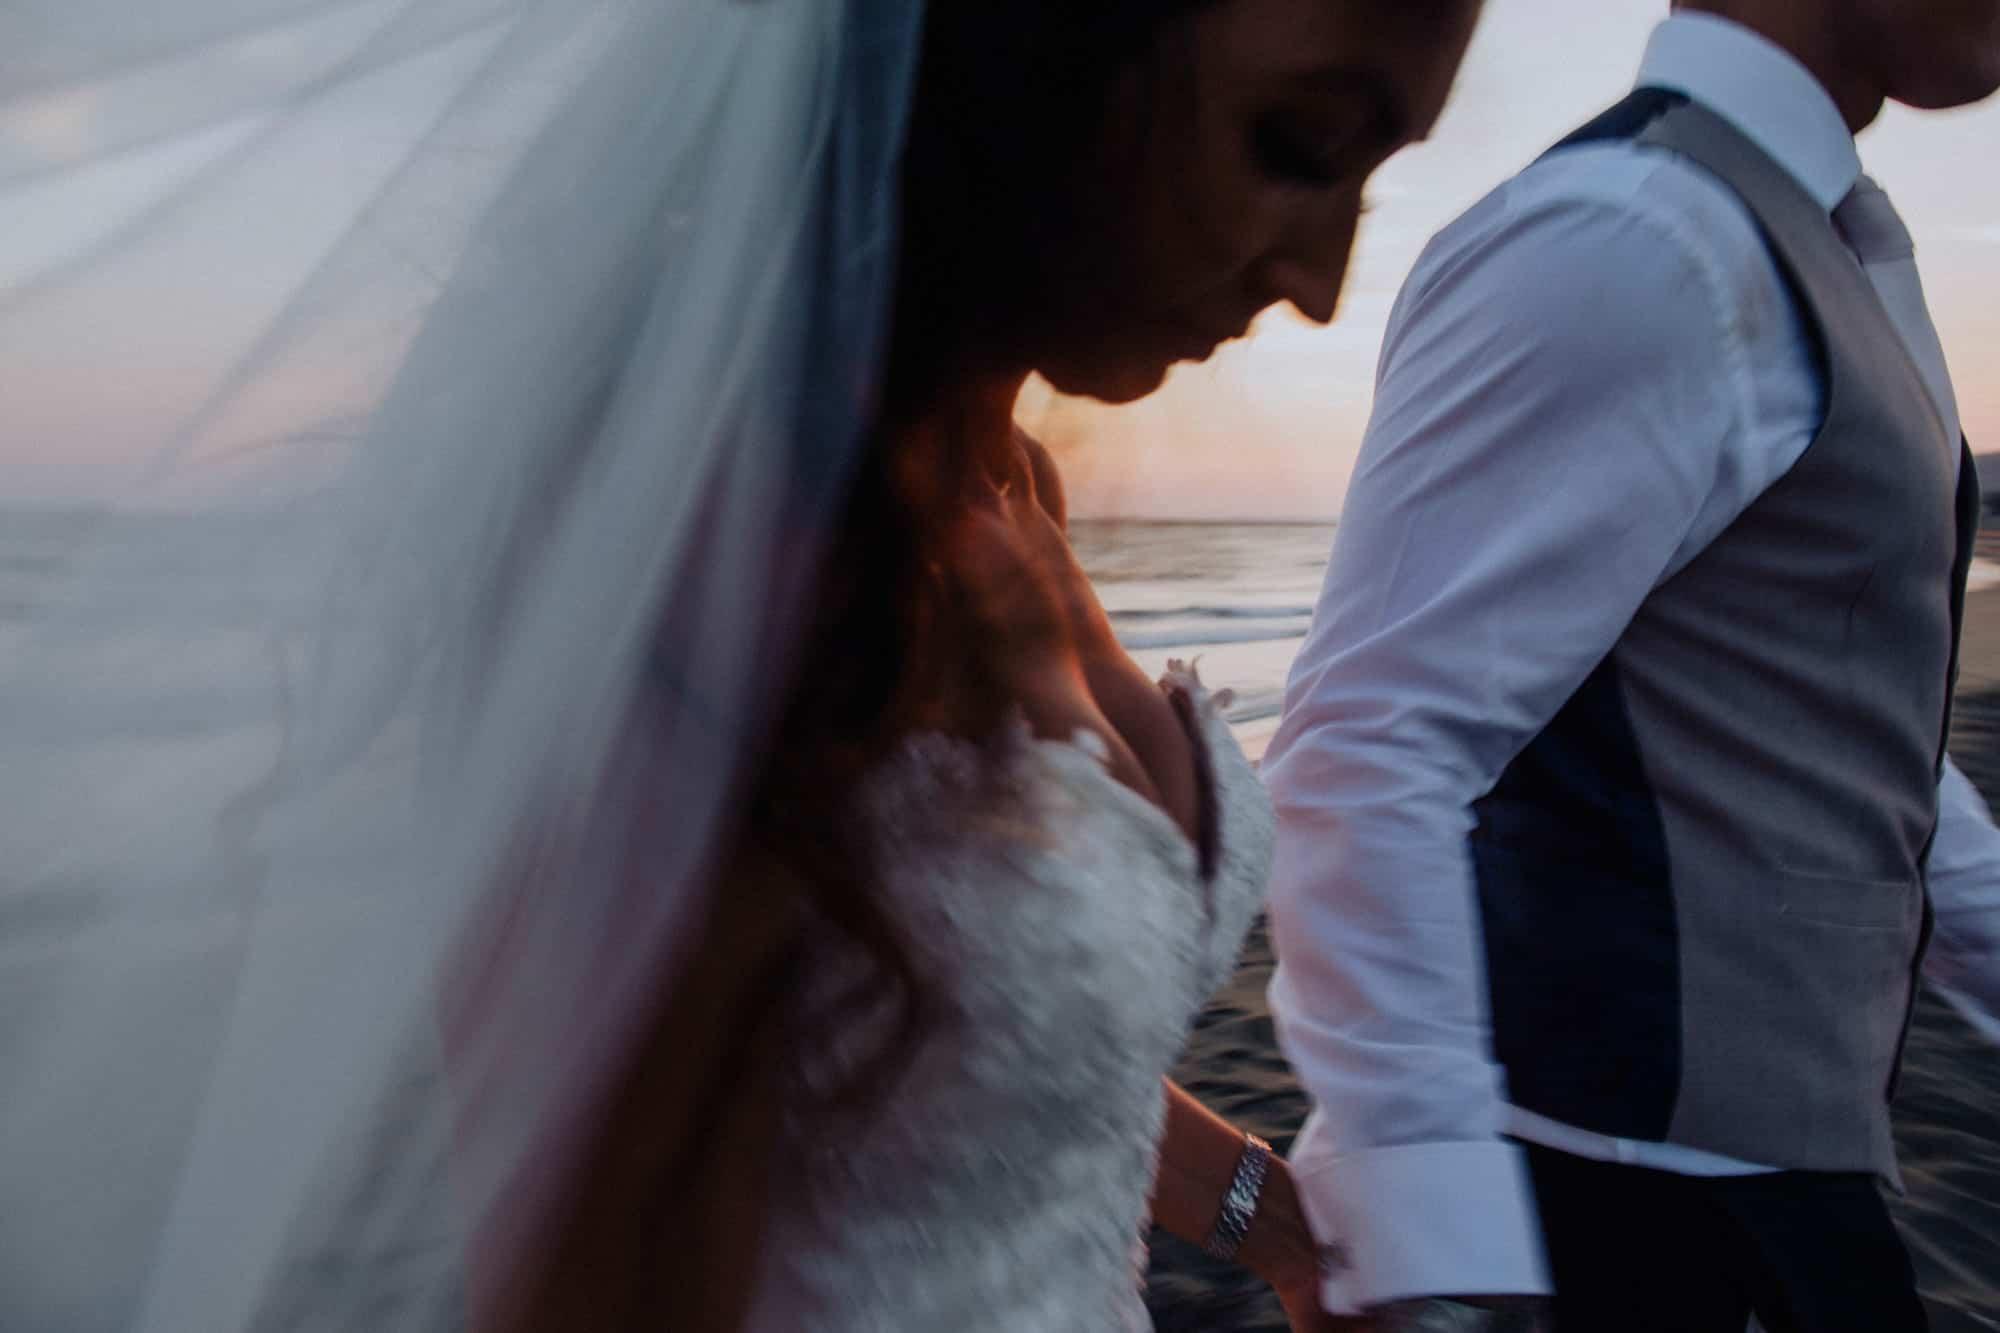 420_JohnnyKat_Wedding_EliasBeachHotel_Limassol_Cyprus_ManonPauffinPhotography_IMG_7318_WebSize